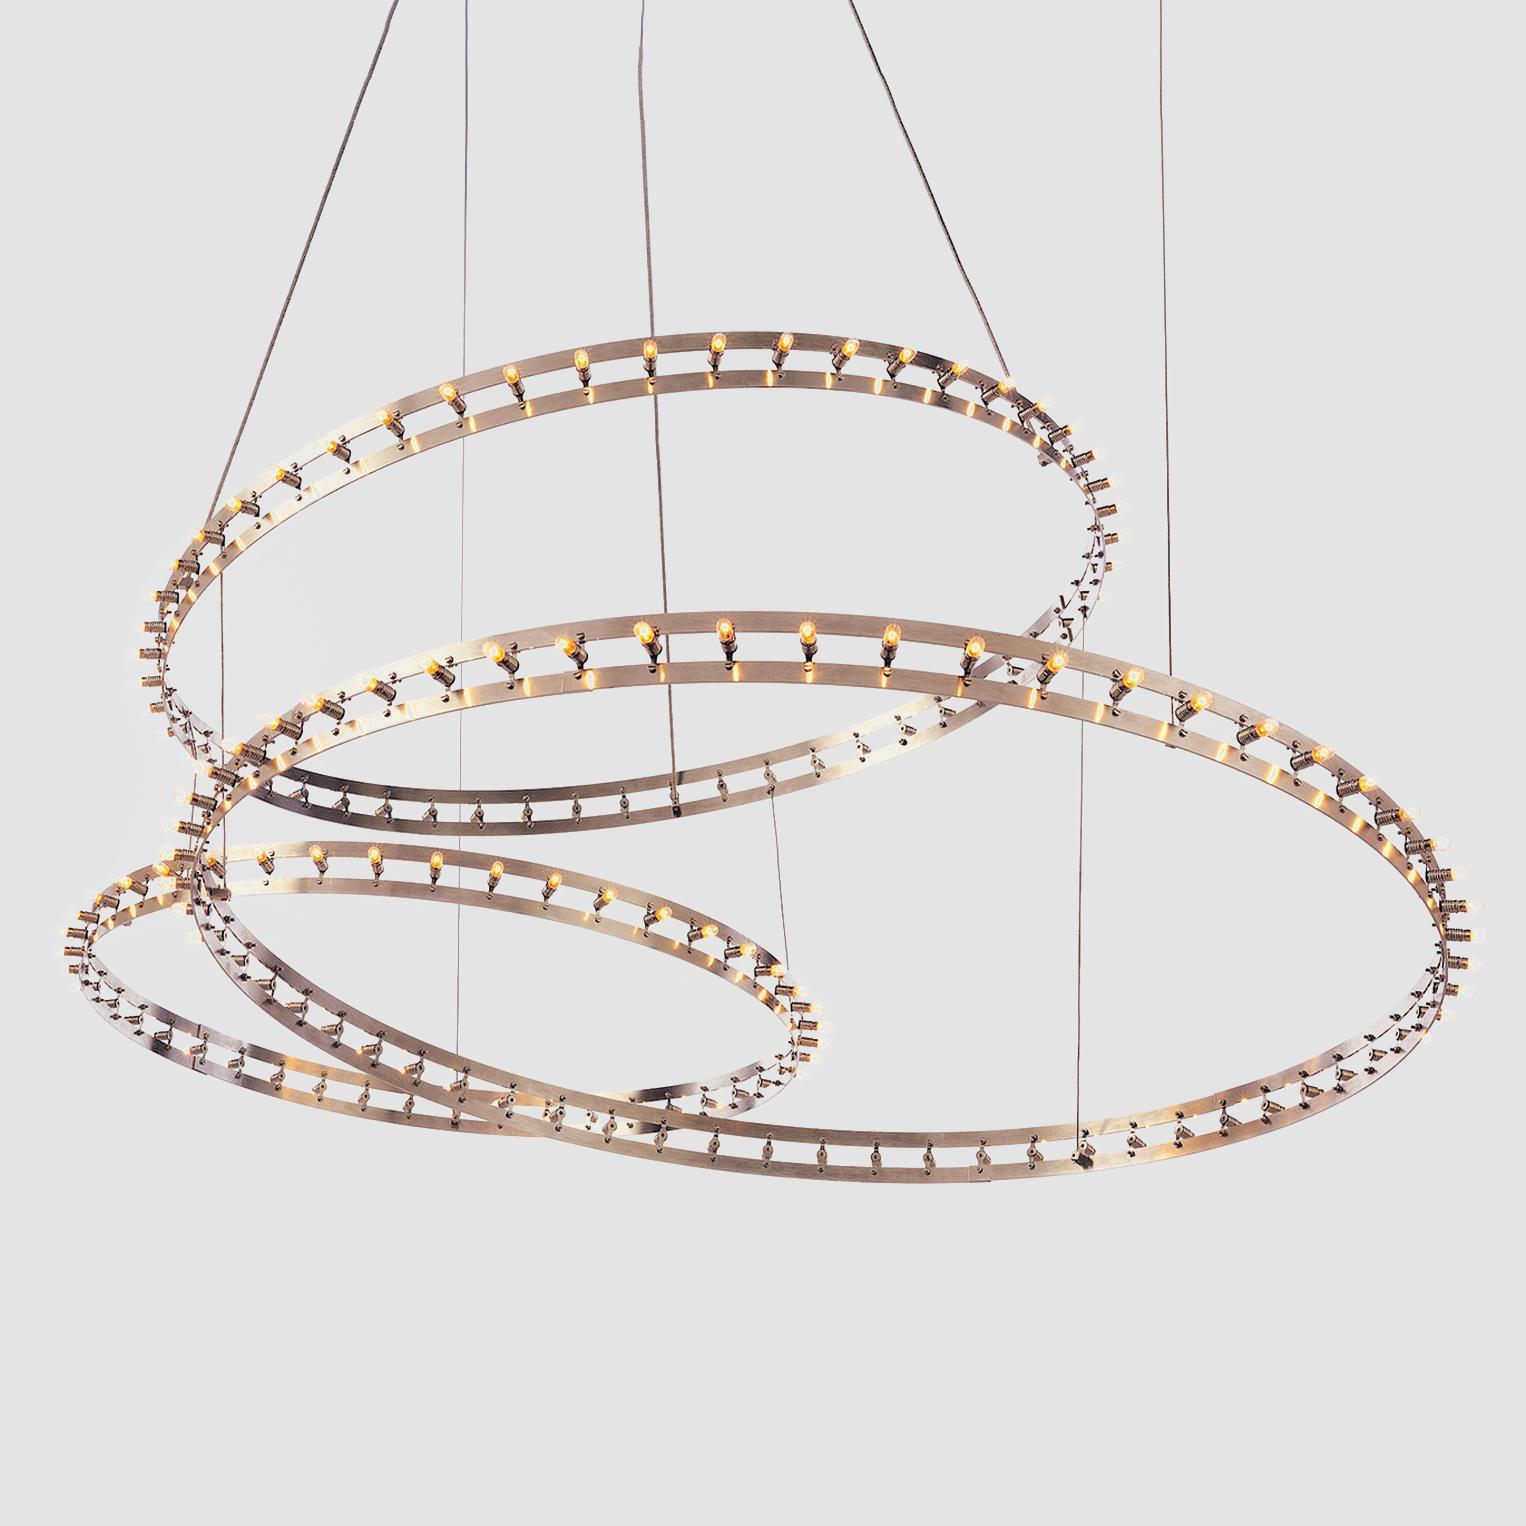 Citadel by Quasar - Design and contemporary ring shape suspension light